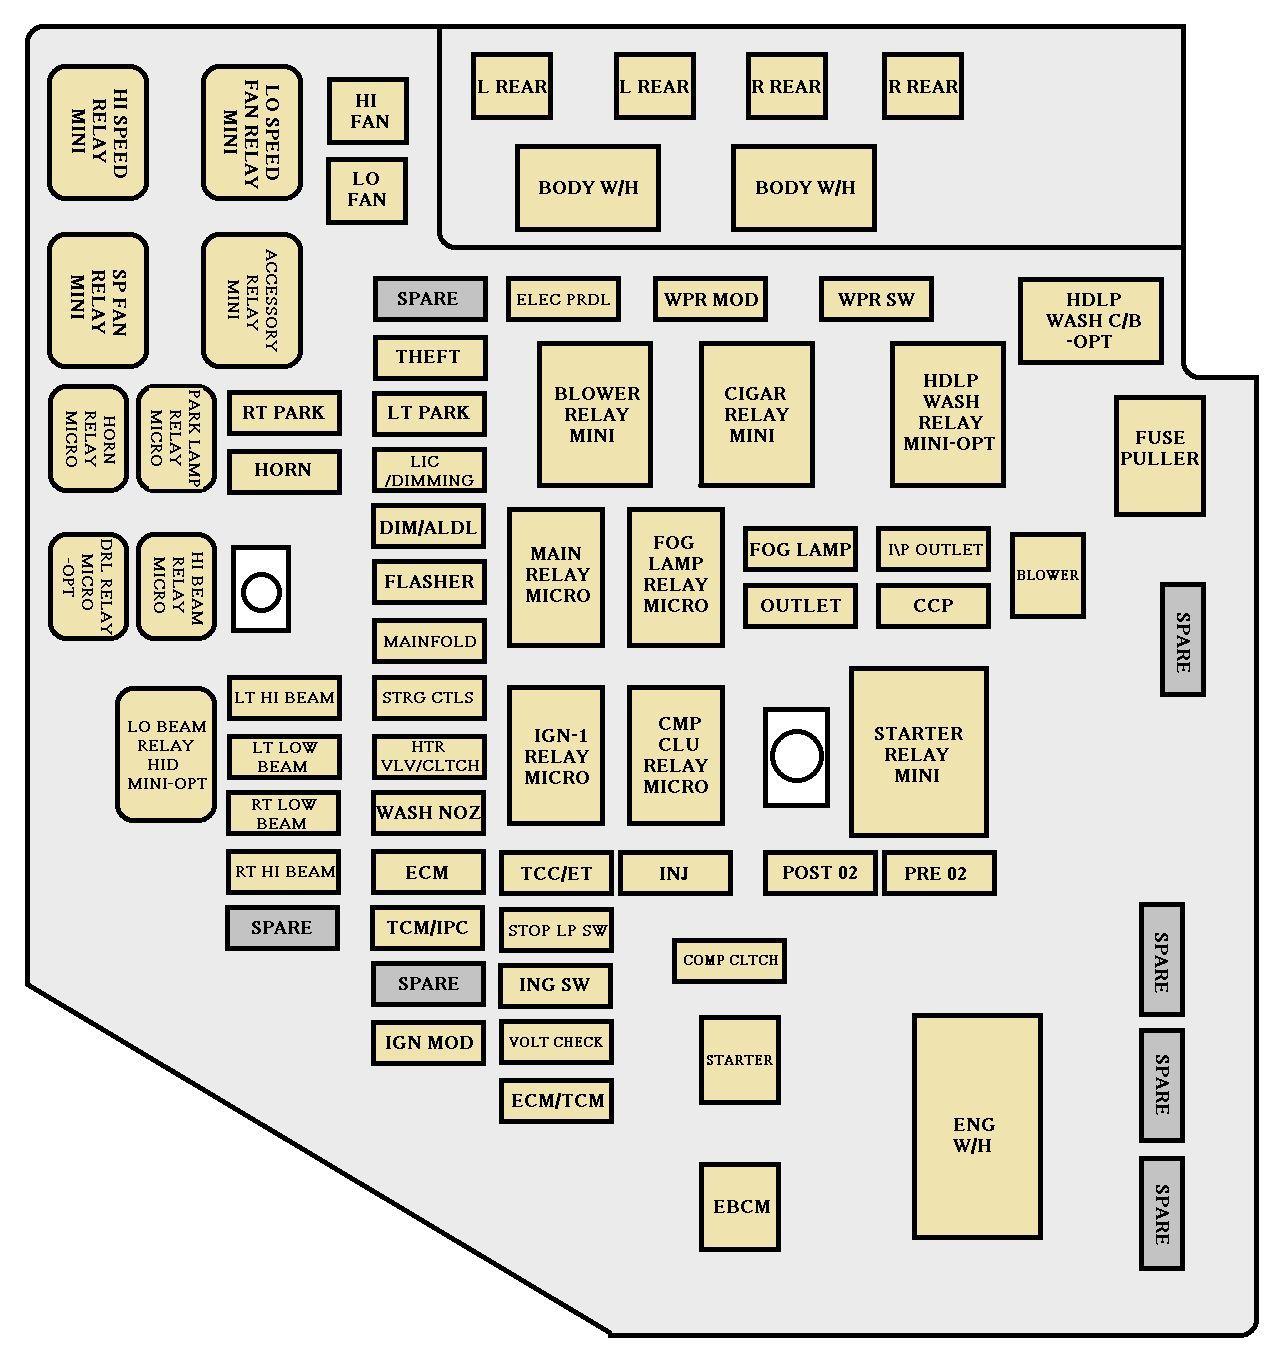 fuse diagram 2002 dts cadillac cts fuse diagram wiring diagram data  cadillac cts fuse diagram wiring